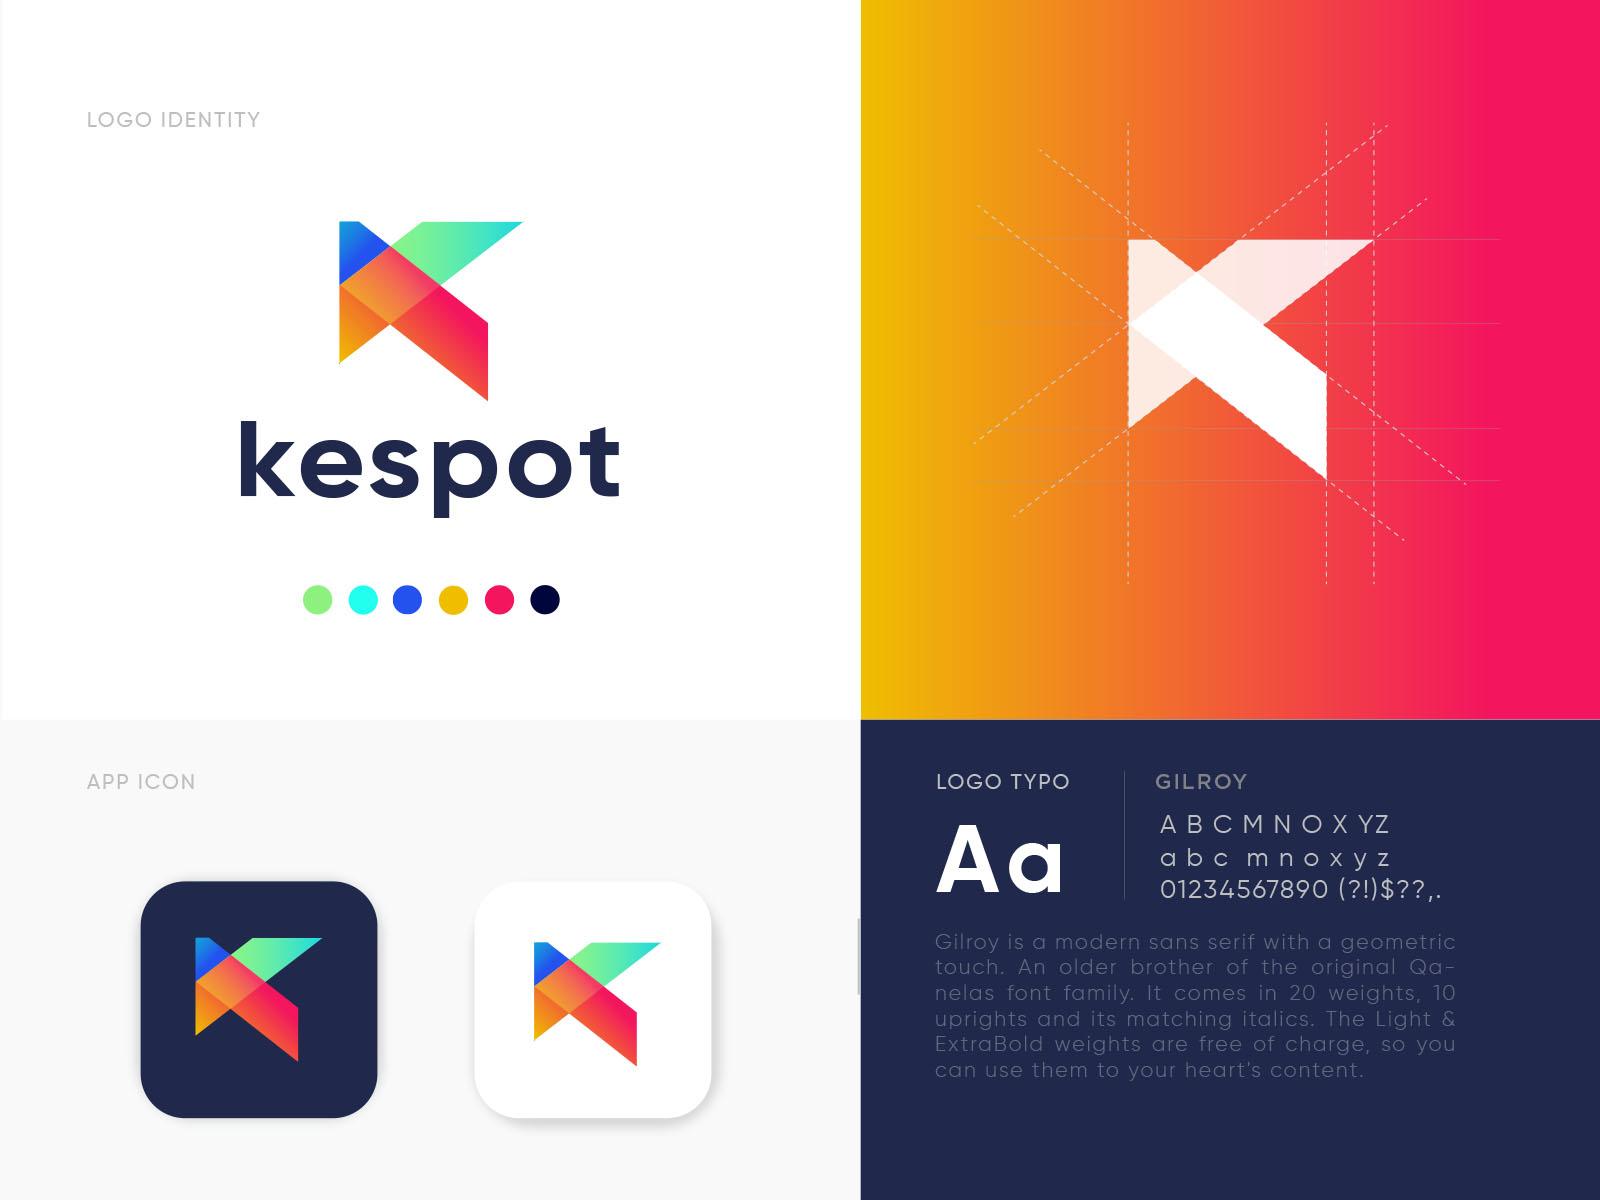 Kespot Logo Design By Ahmed Rumon On Dribbble